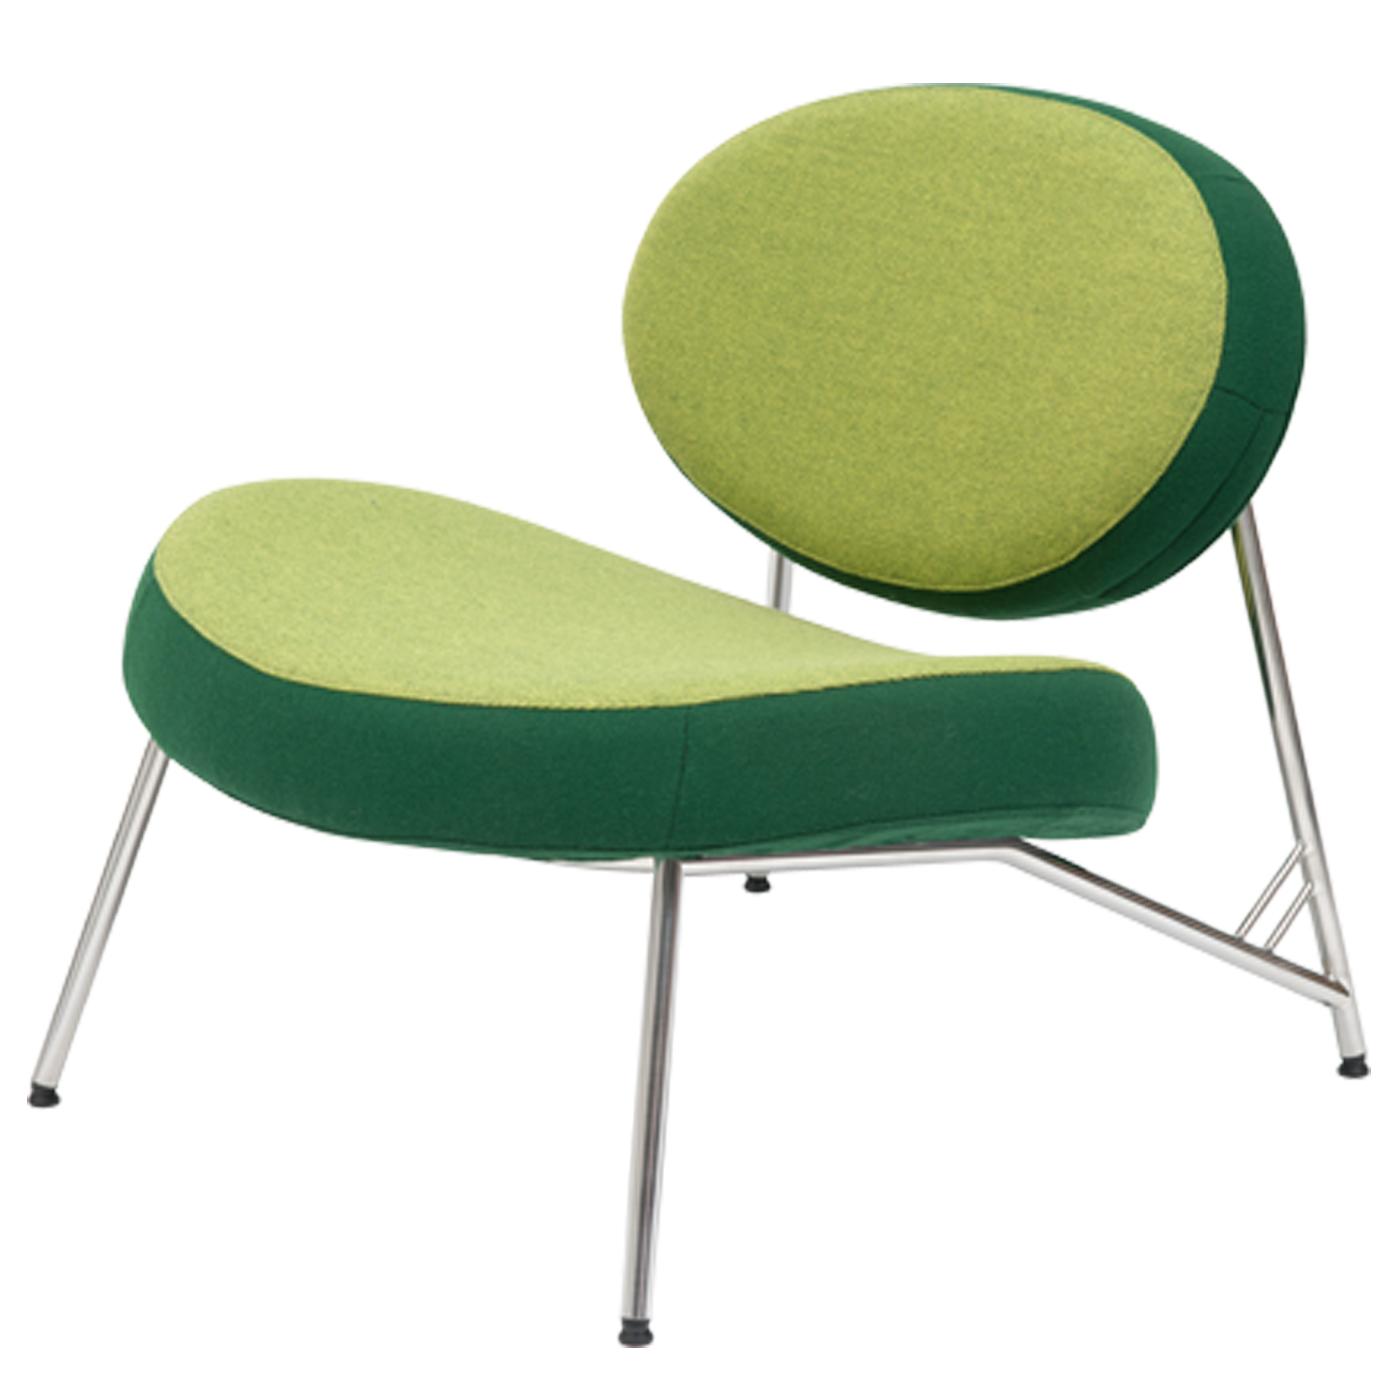 Tipi fauteuil